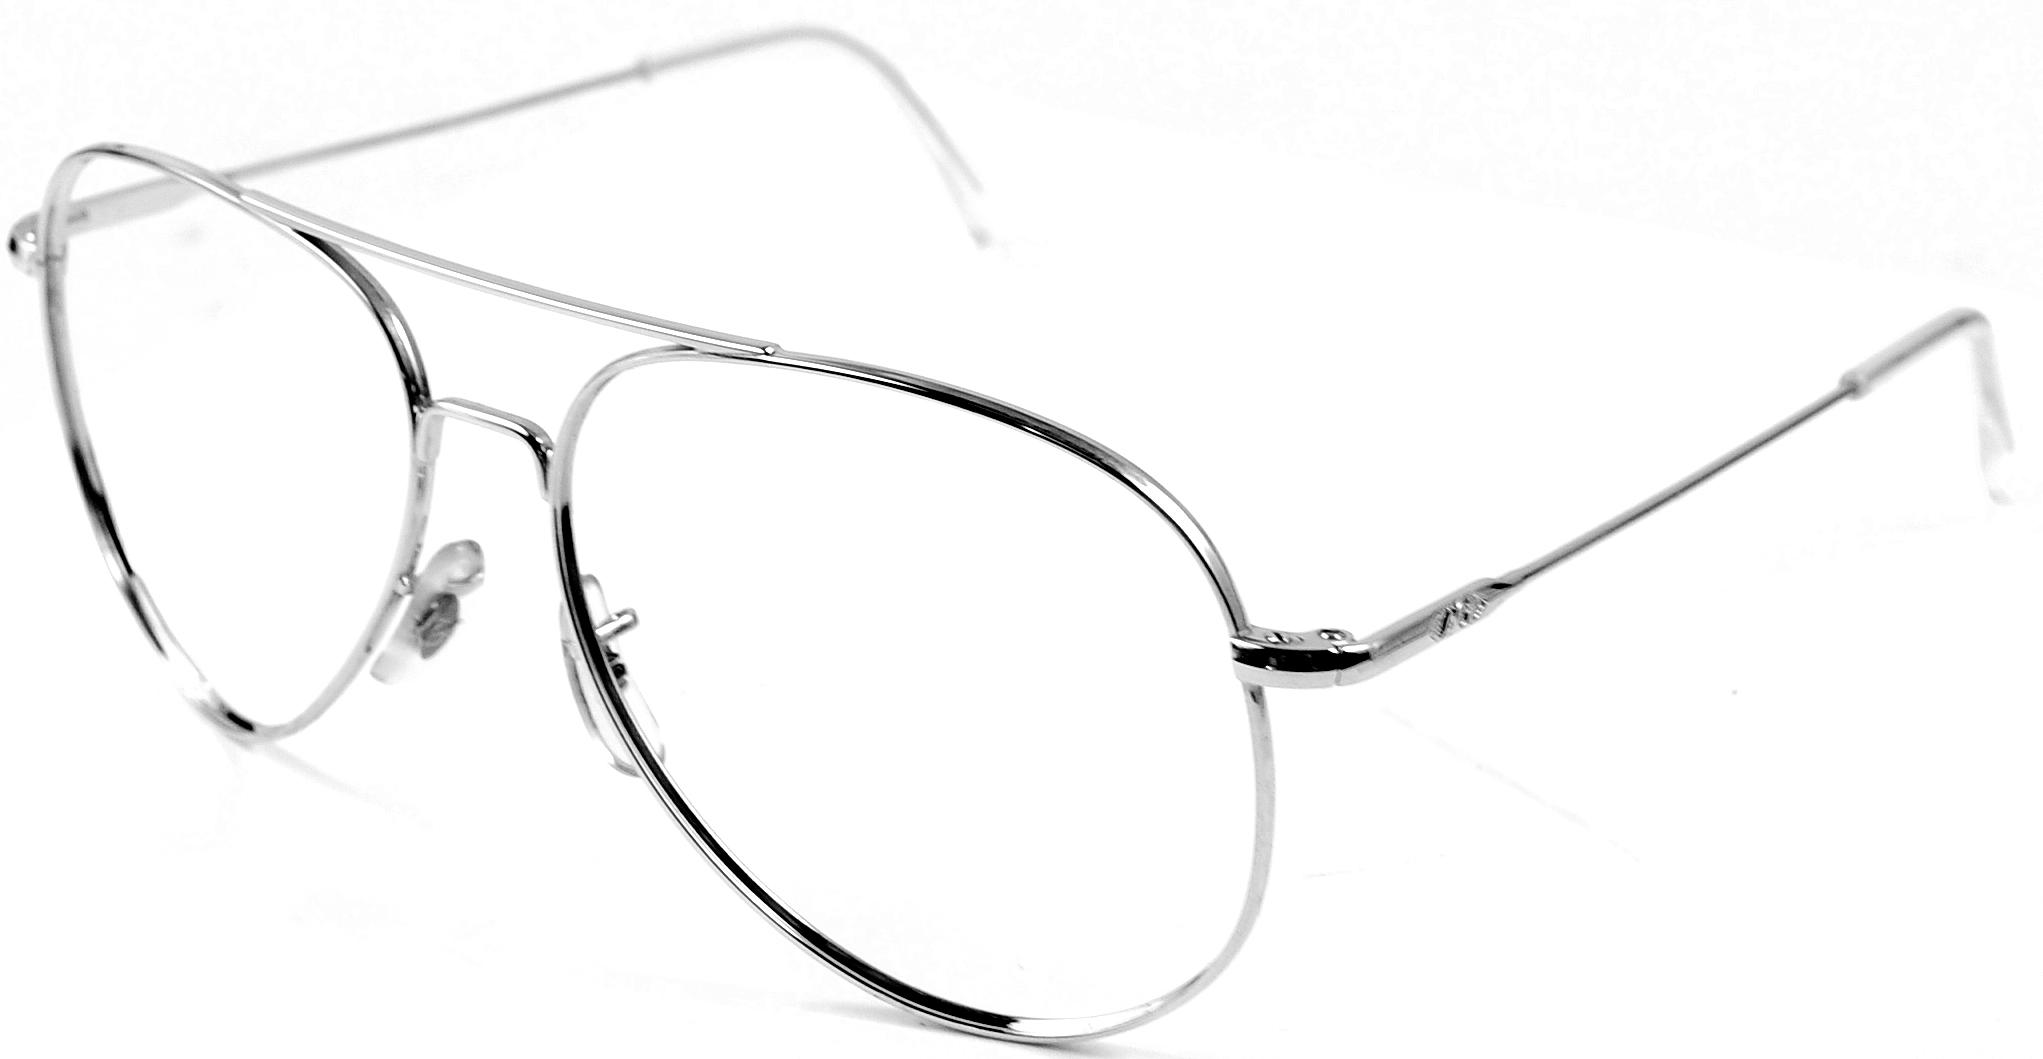 AO General Flight Gear Series Sunglasses - Frame Only